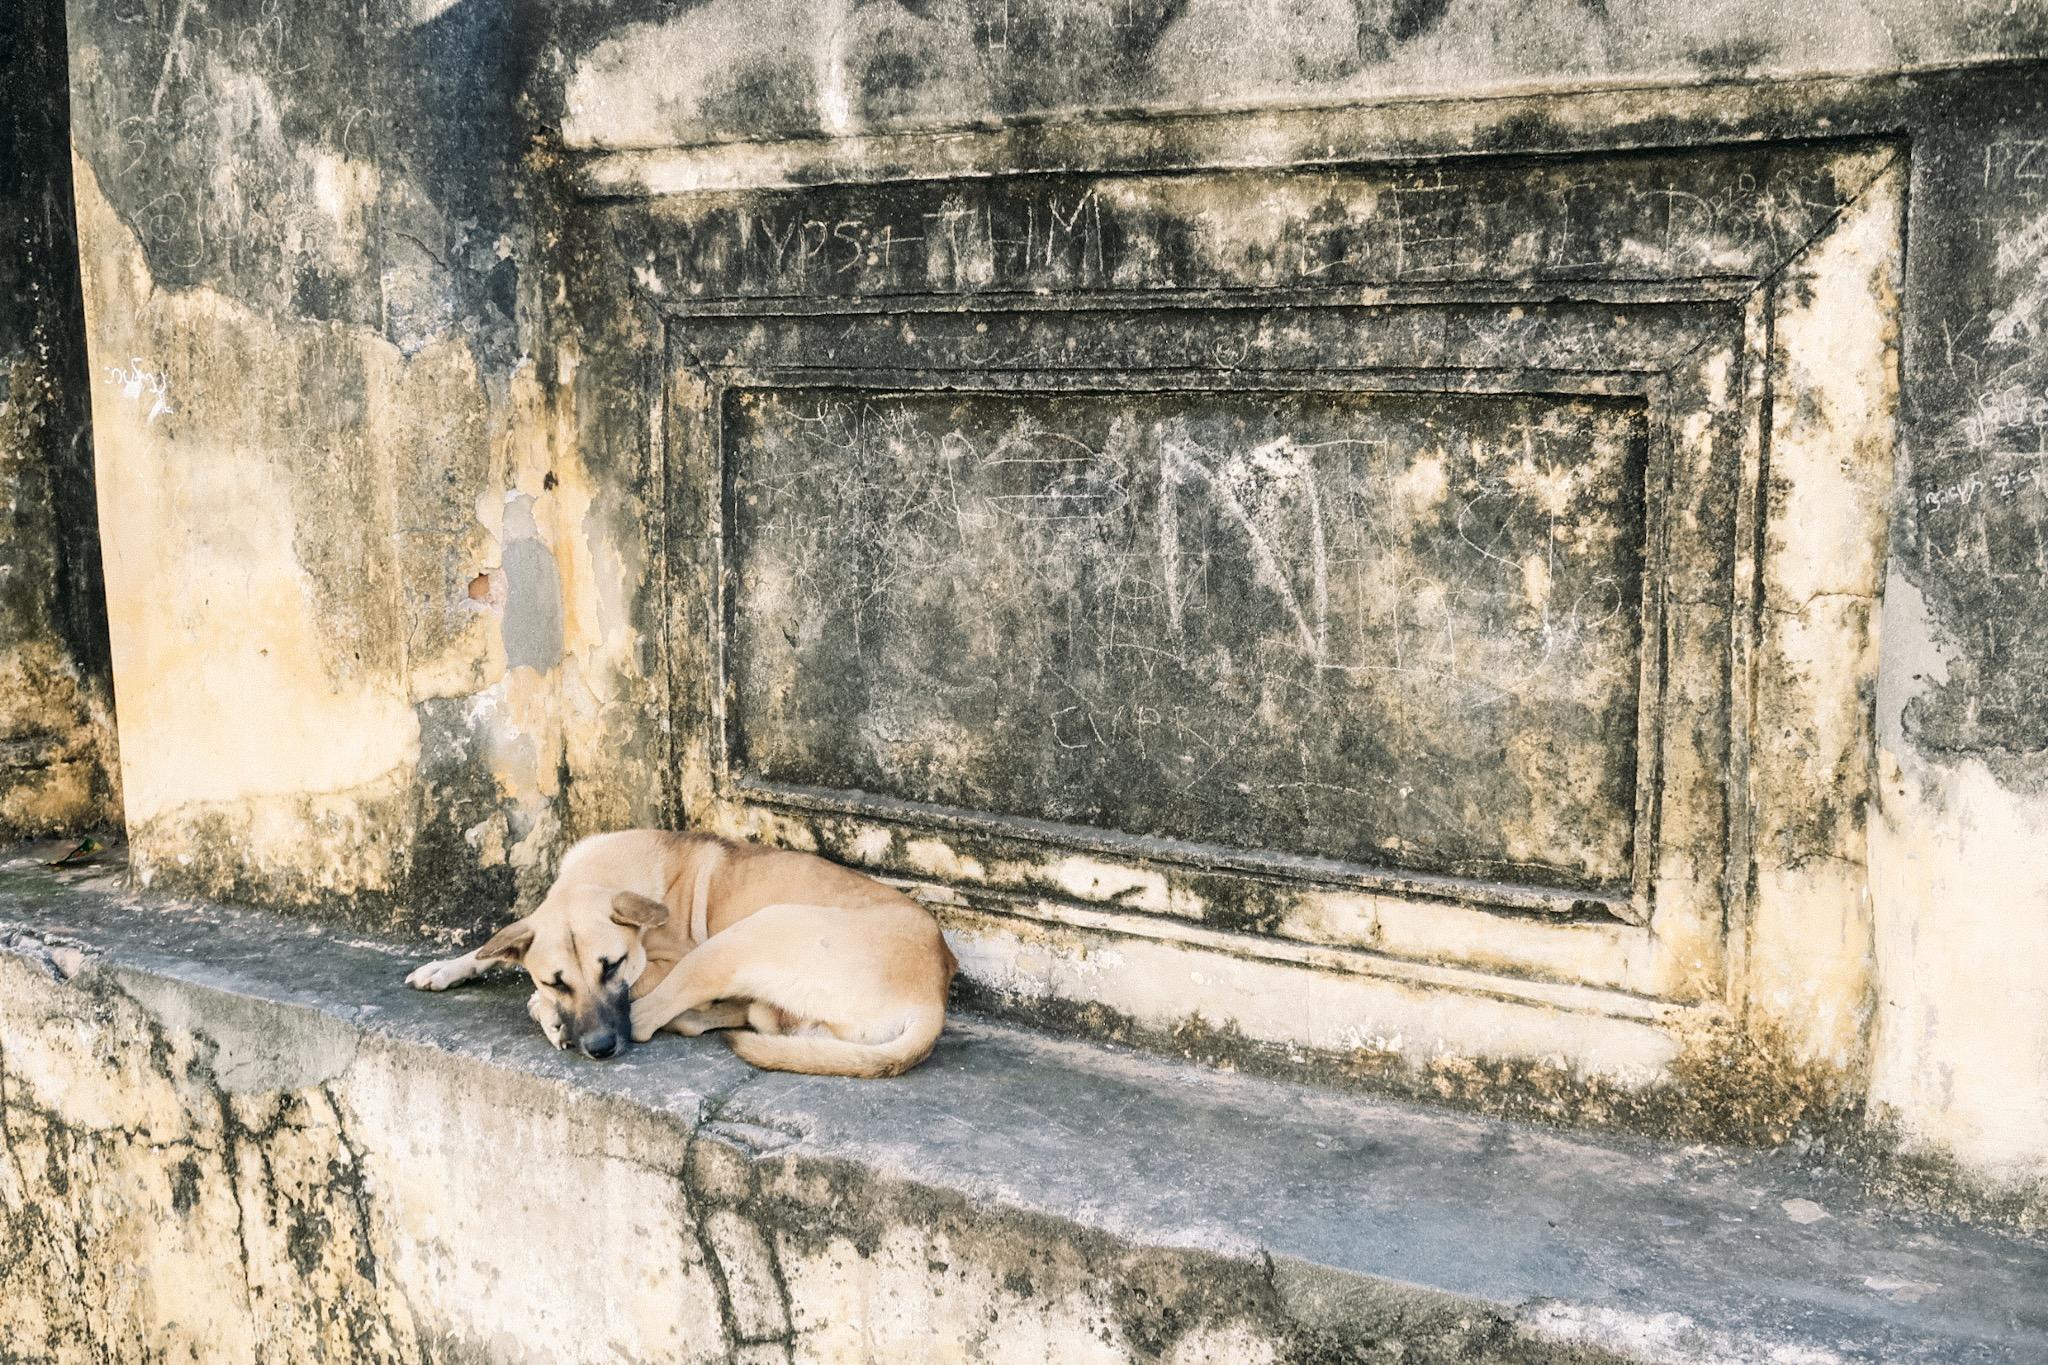 Yadana Hsemee Pagoda and puppy